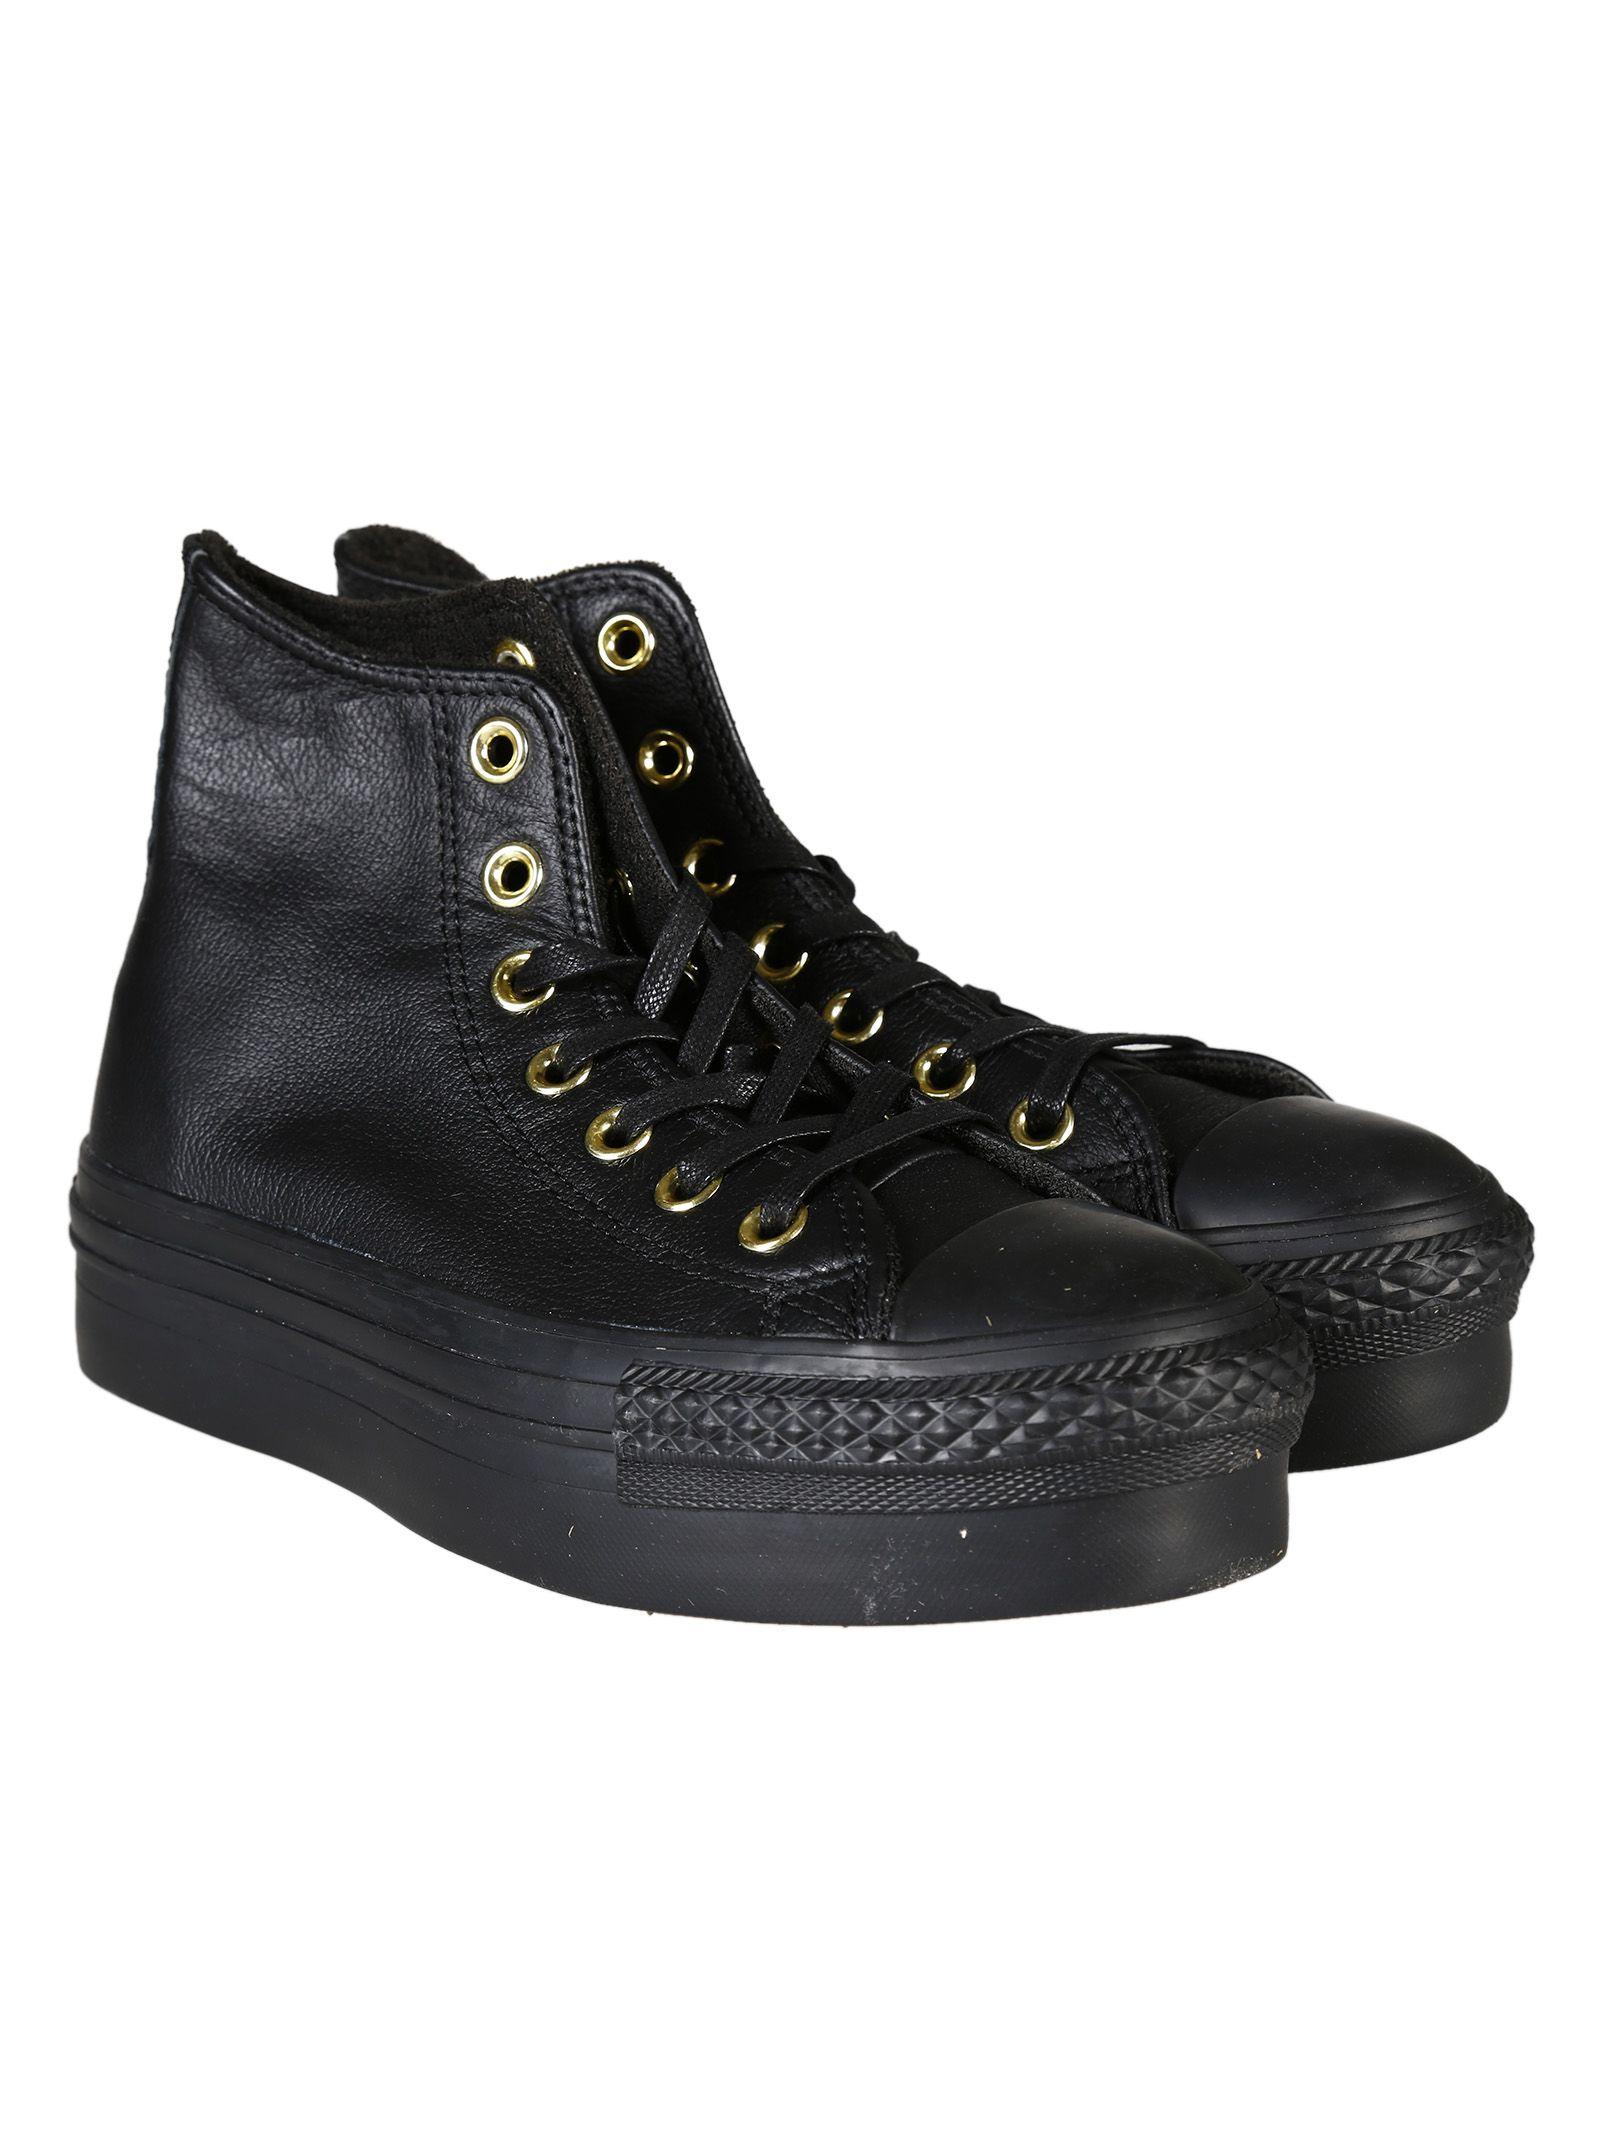 converse hi platform leather